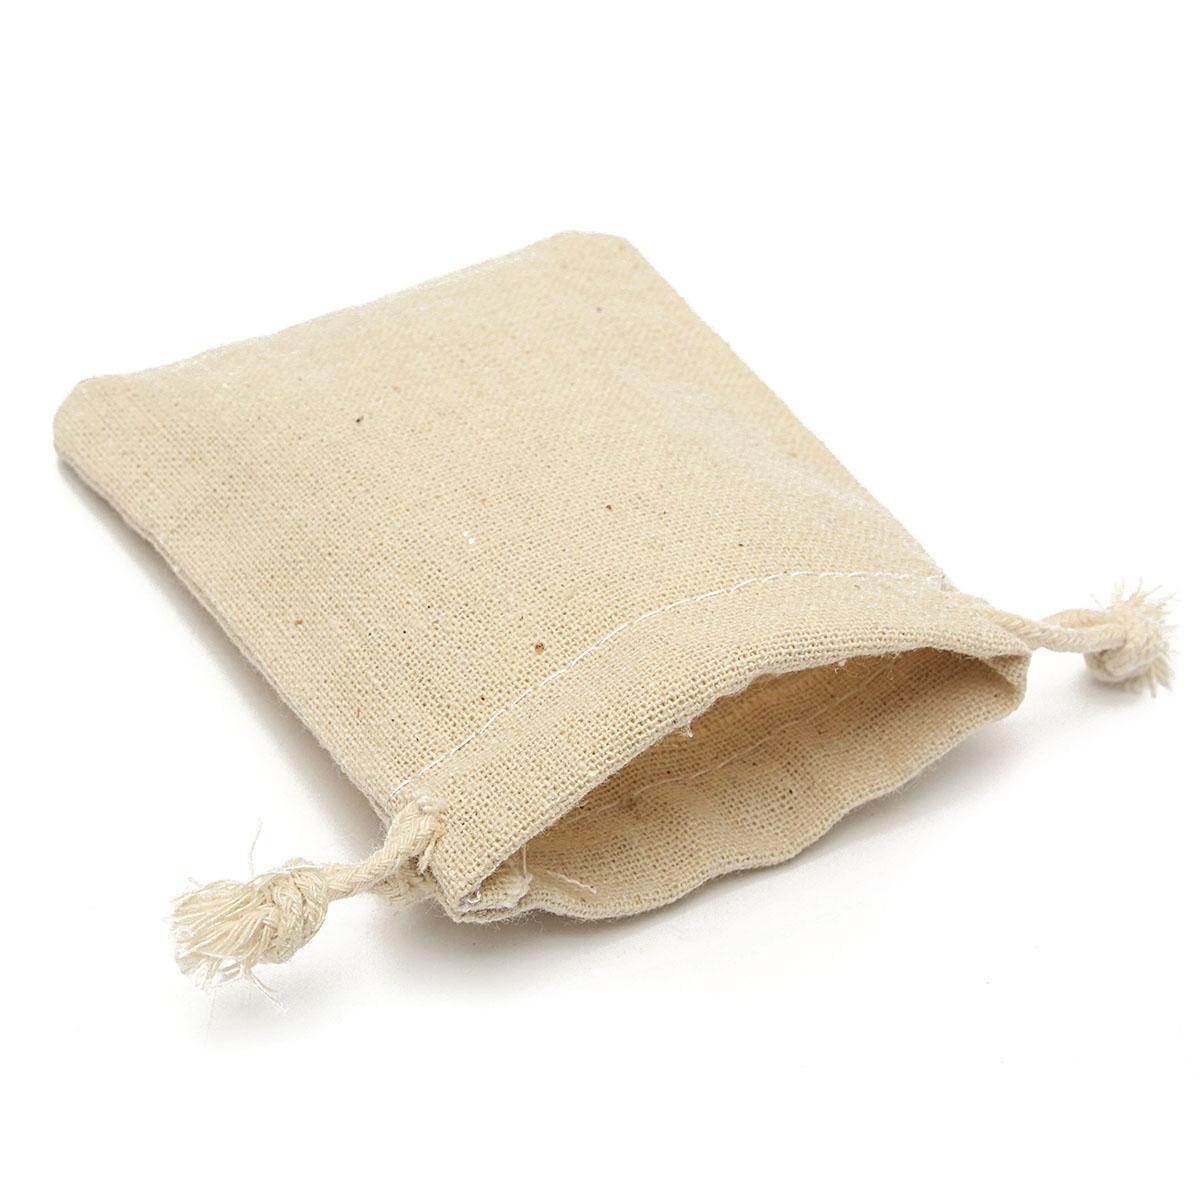 30Pcs Natural Linen Pouch Burlap Jute Sack Jewelry Pouch Drawstring Gift Bags 8x10cm